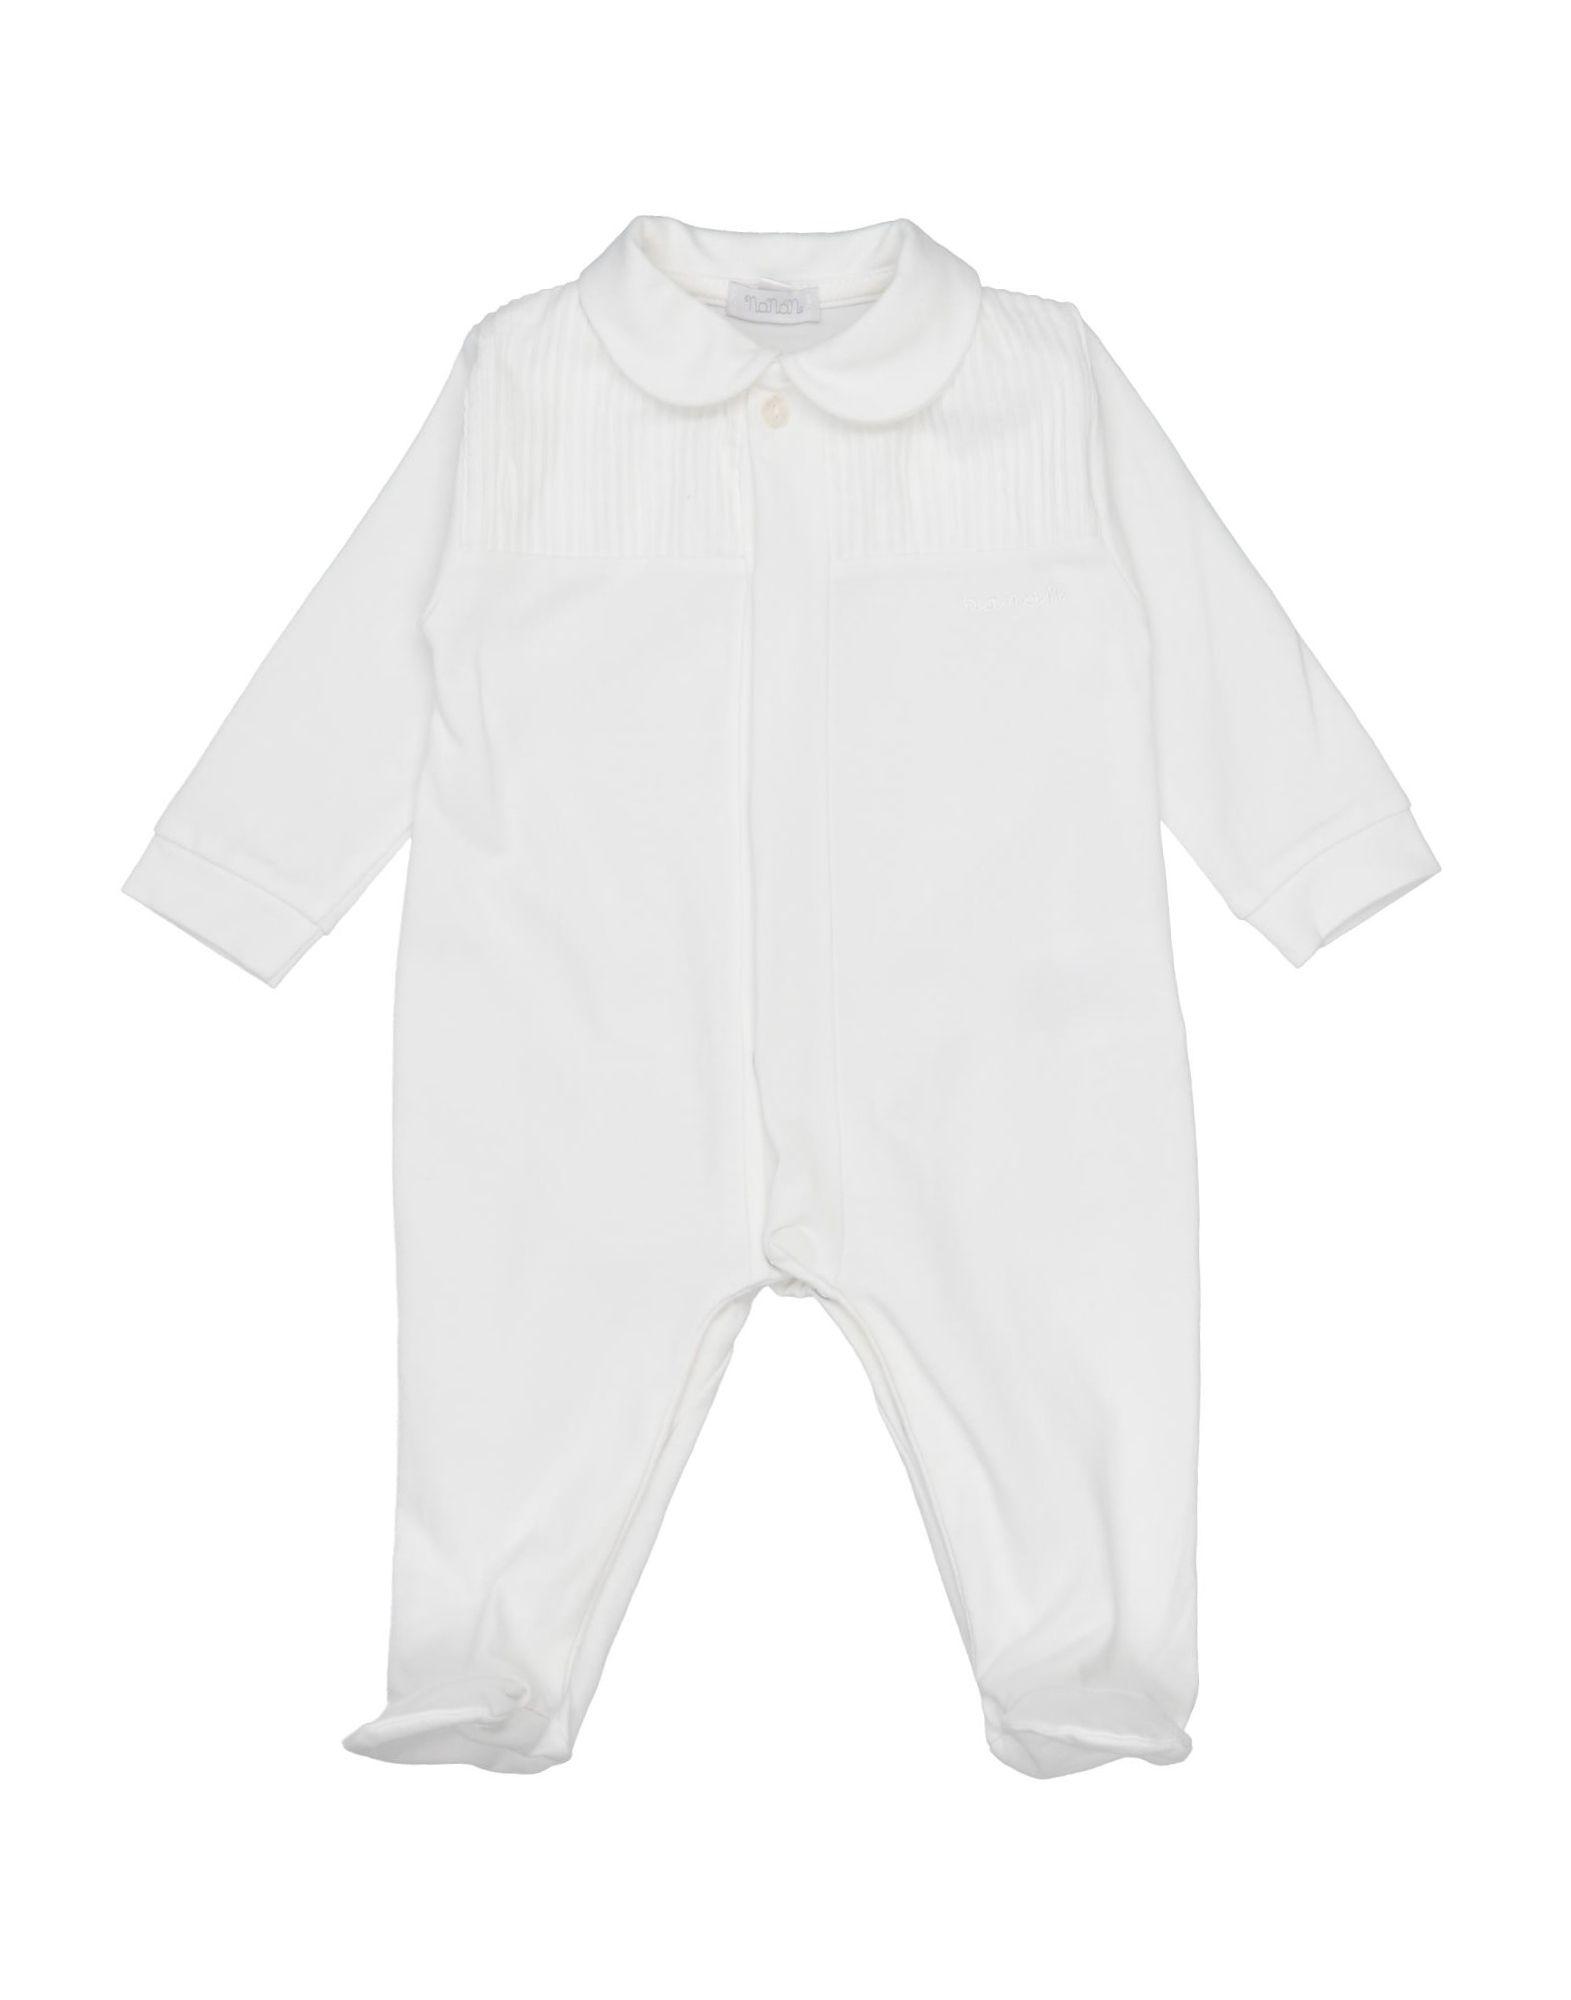 YOOX.COM(ユークス)《セール開催中》NAN?N ガールズ 0-24 ヶ月 乳幼児用ロンパース ホワイト 3 コットン 95% / ポリウレタン 5%